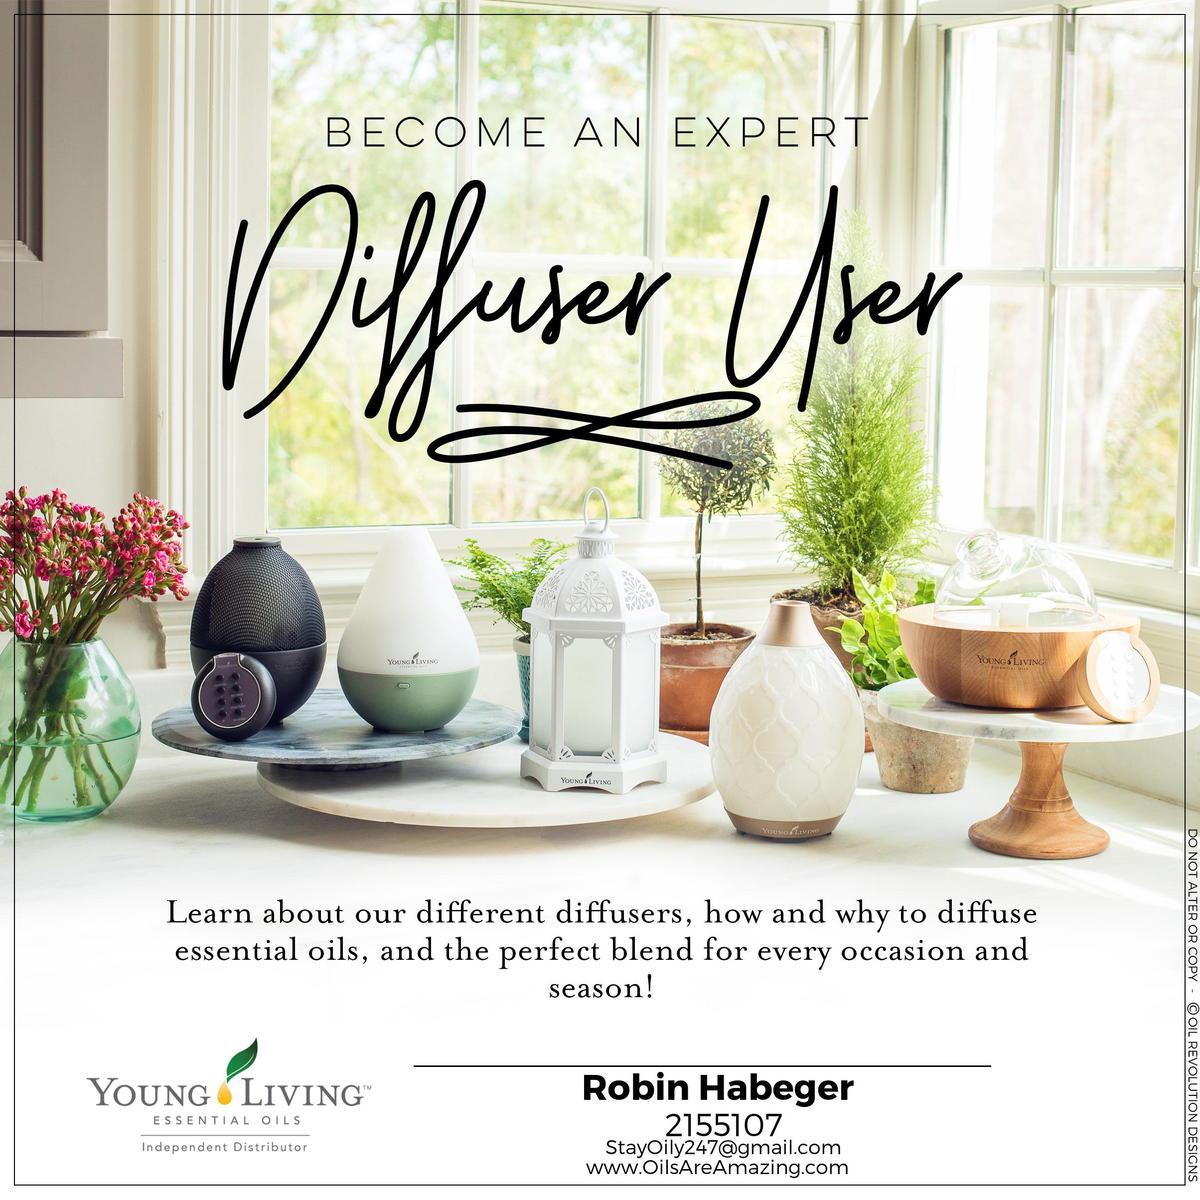 Become an Expert Diffuser User